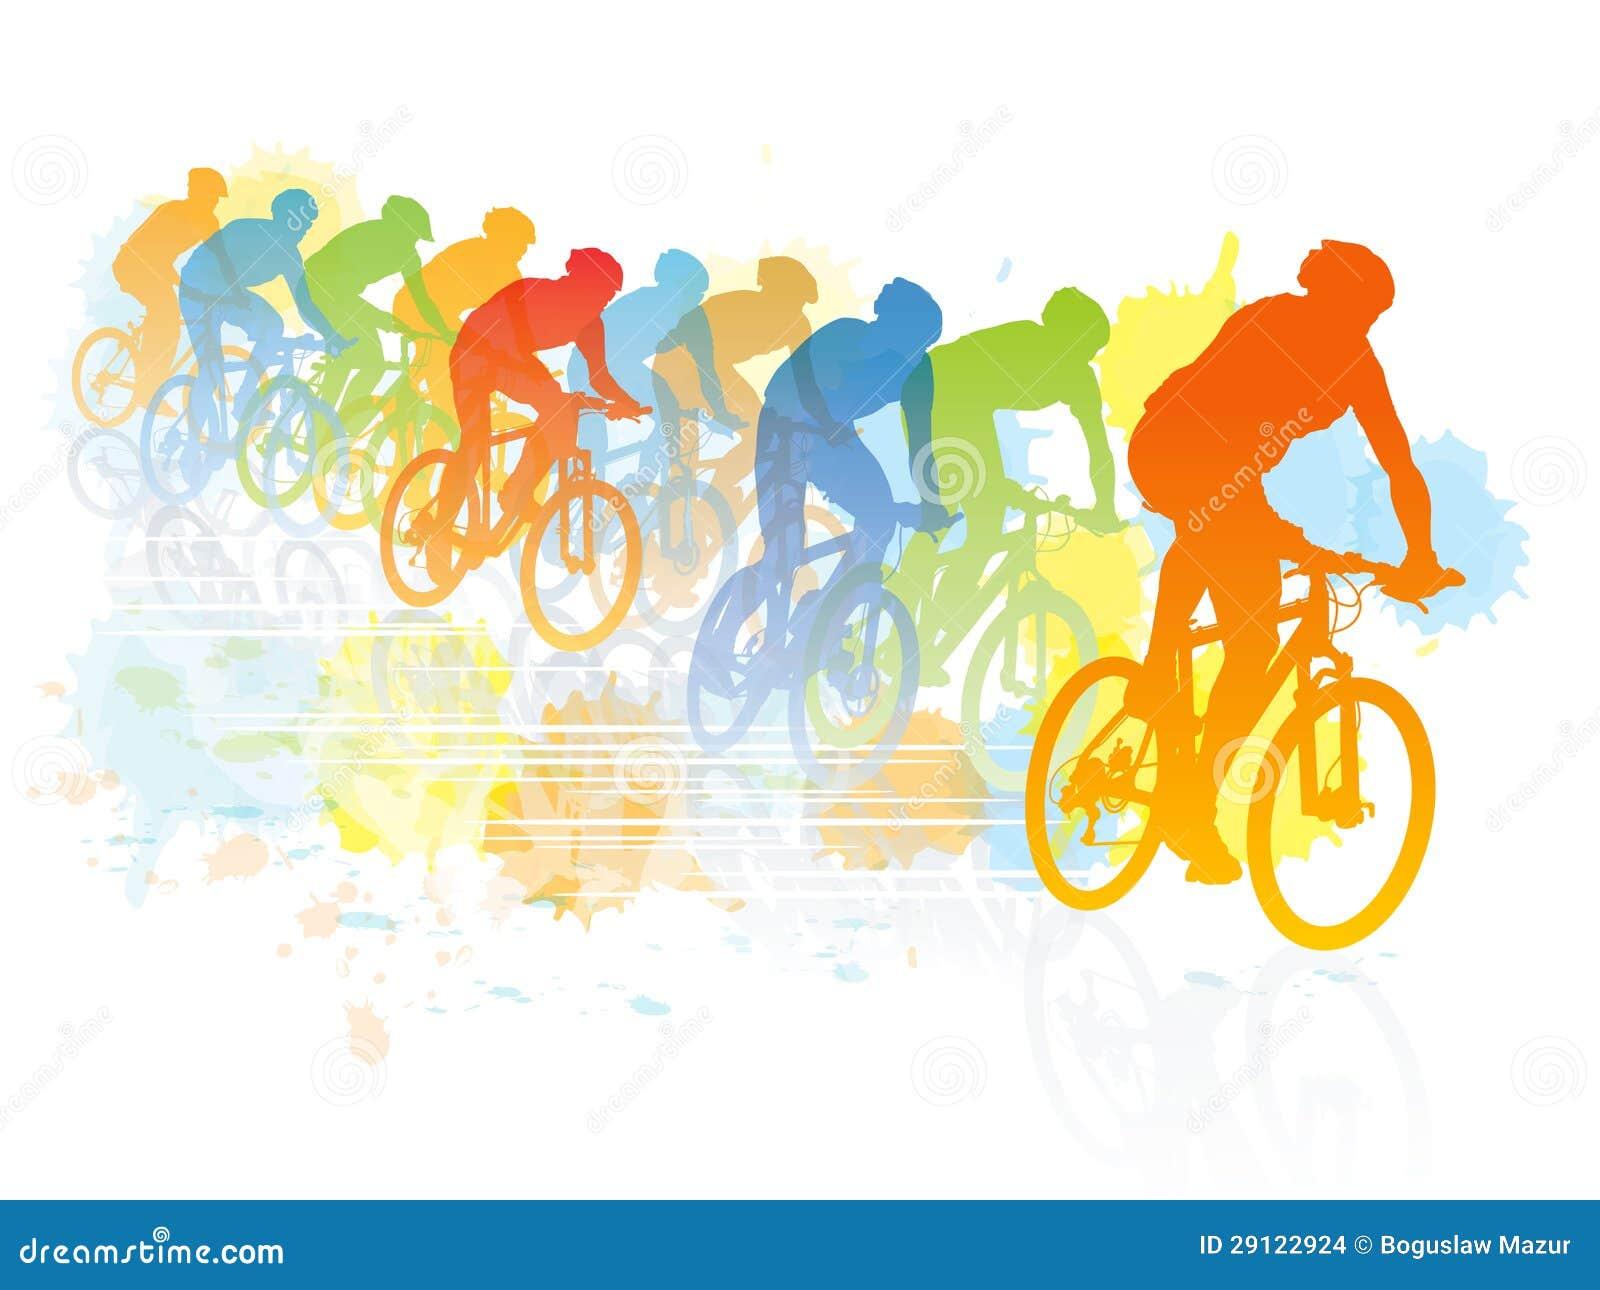 Bike race stock vector. Illustration of leisure, action ...